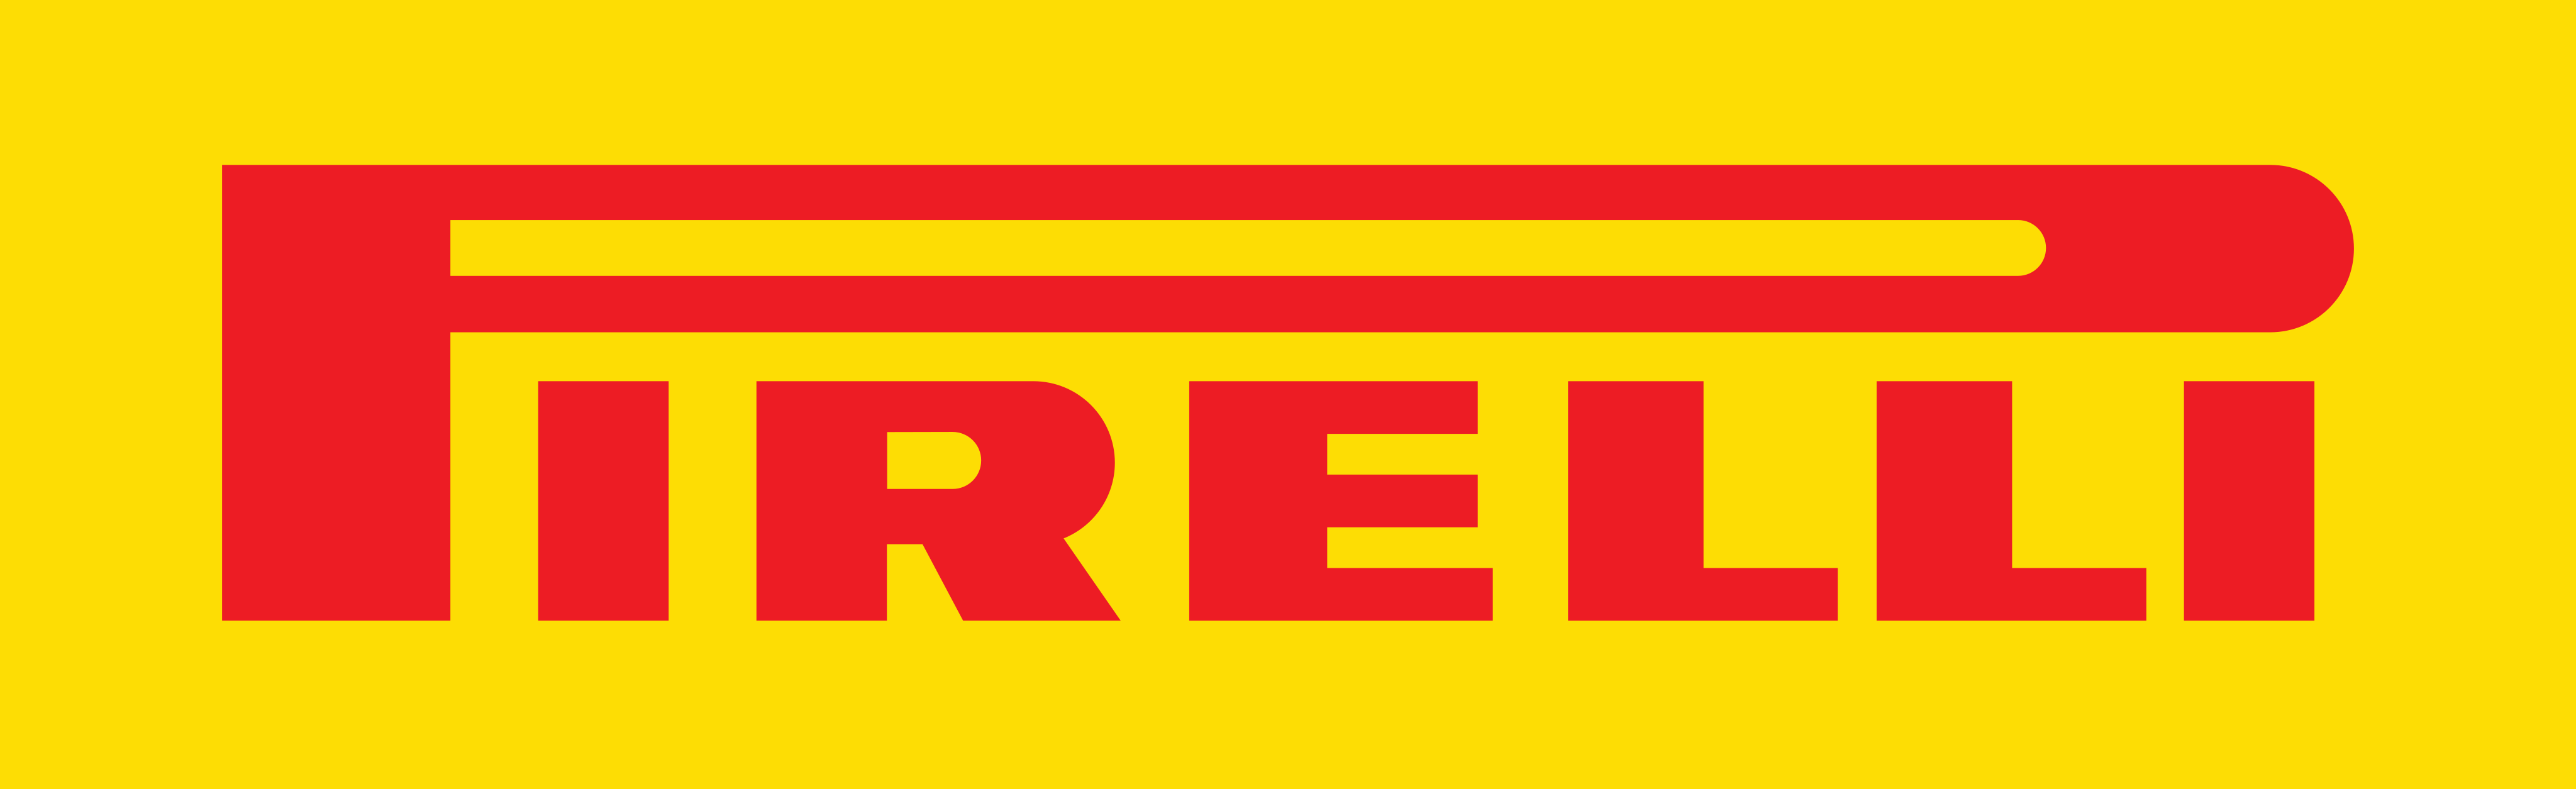 pirelli logo - Pirelli Logo